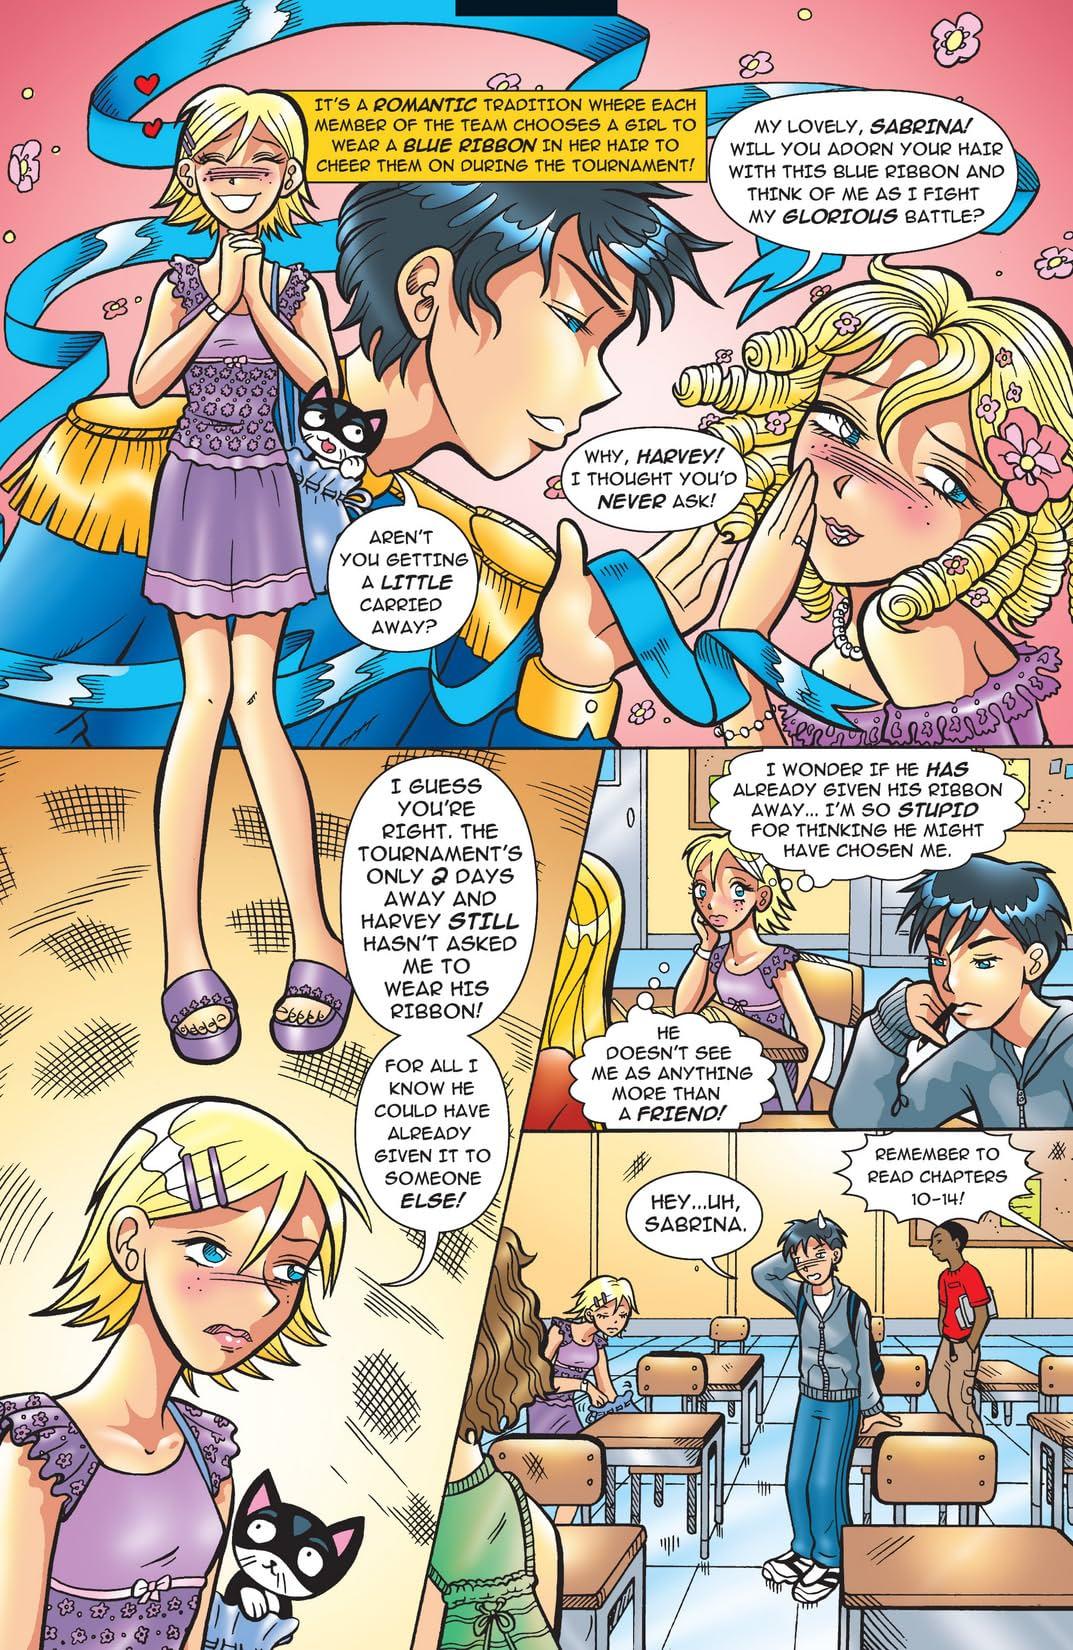 Sabrina Manga #2